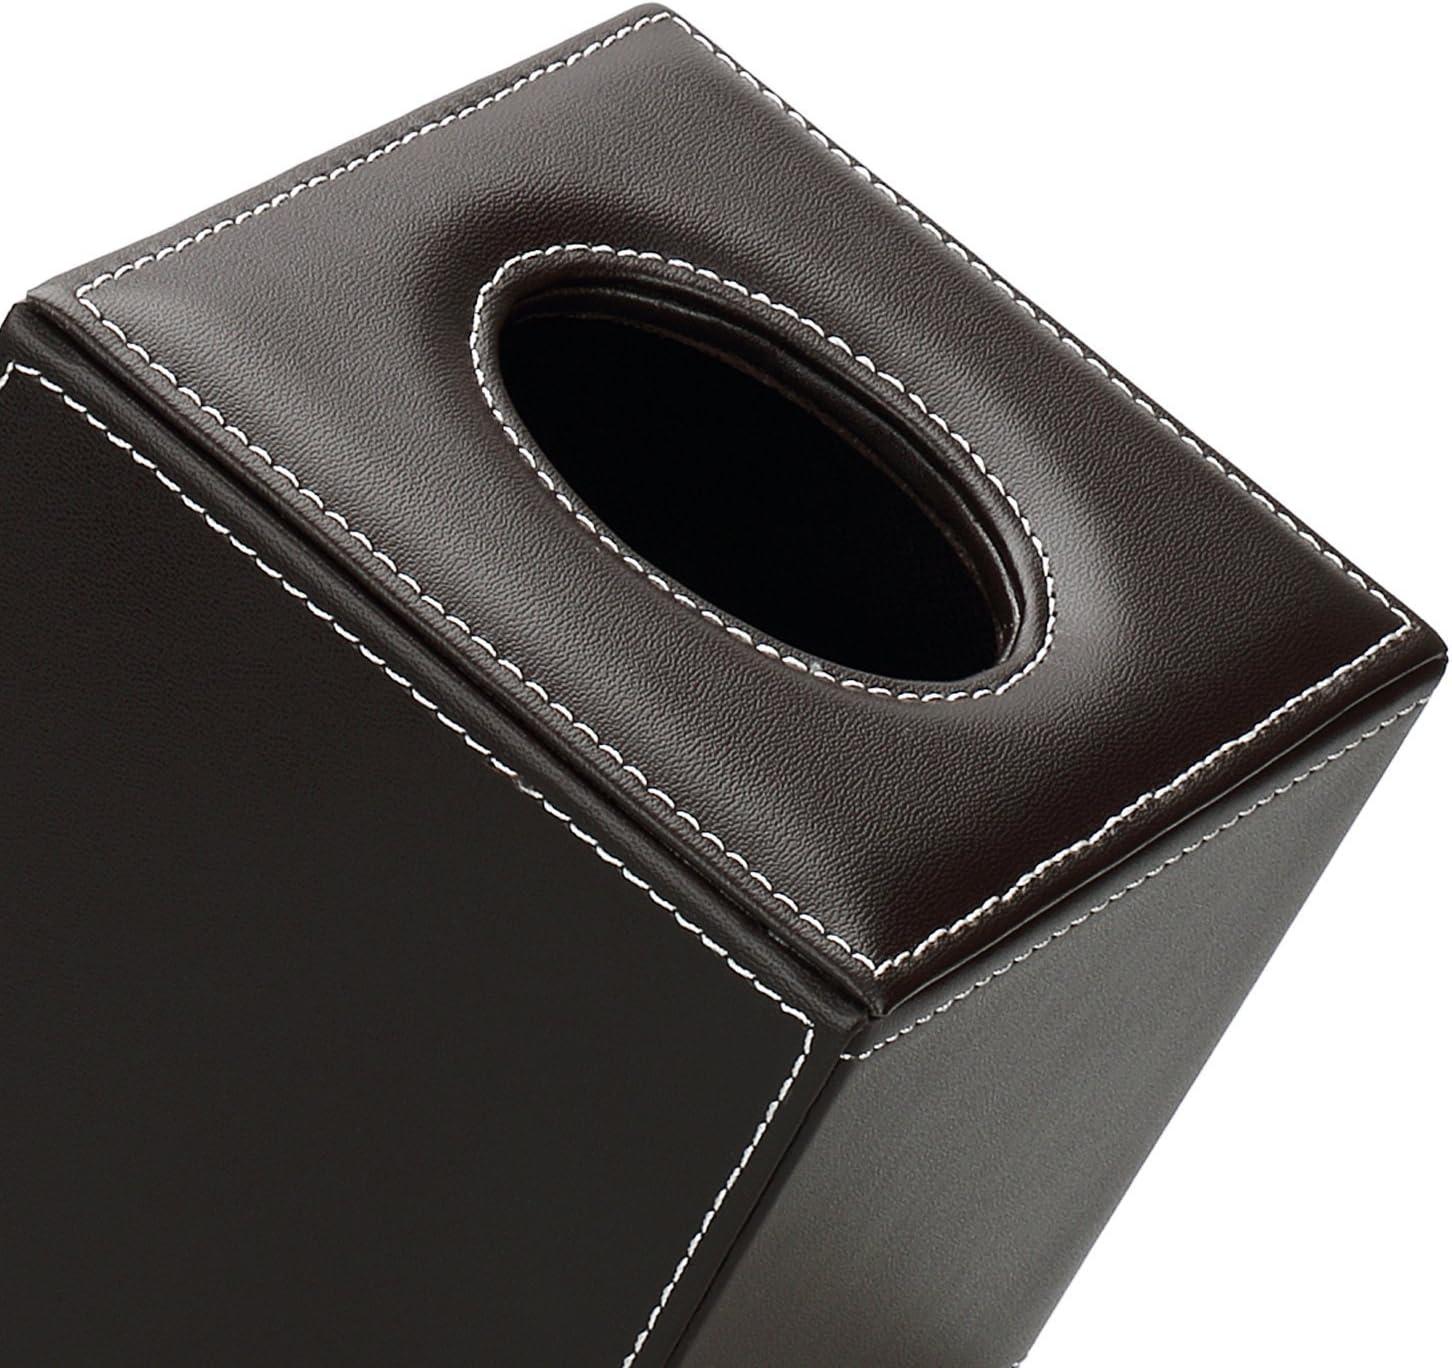 Marble KINGFOM Leder Quadratisch Kosmetikt/ücherbox